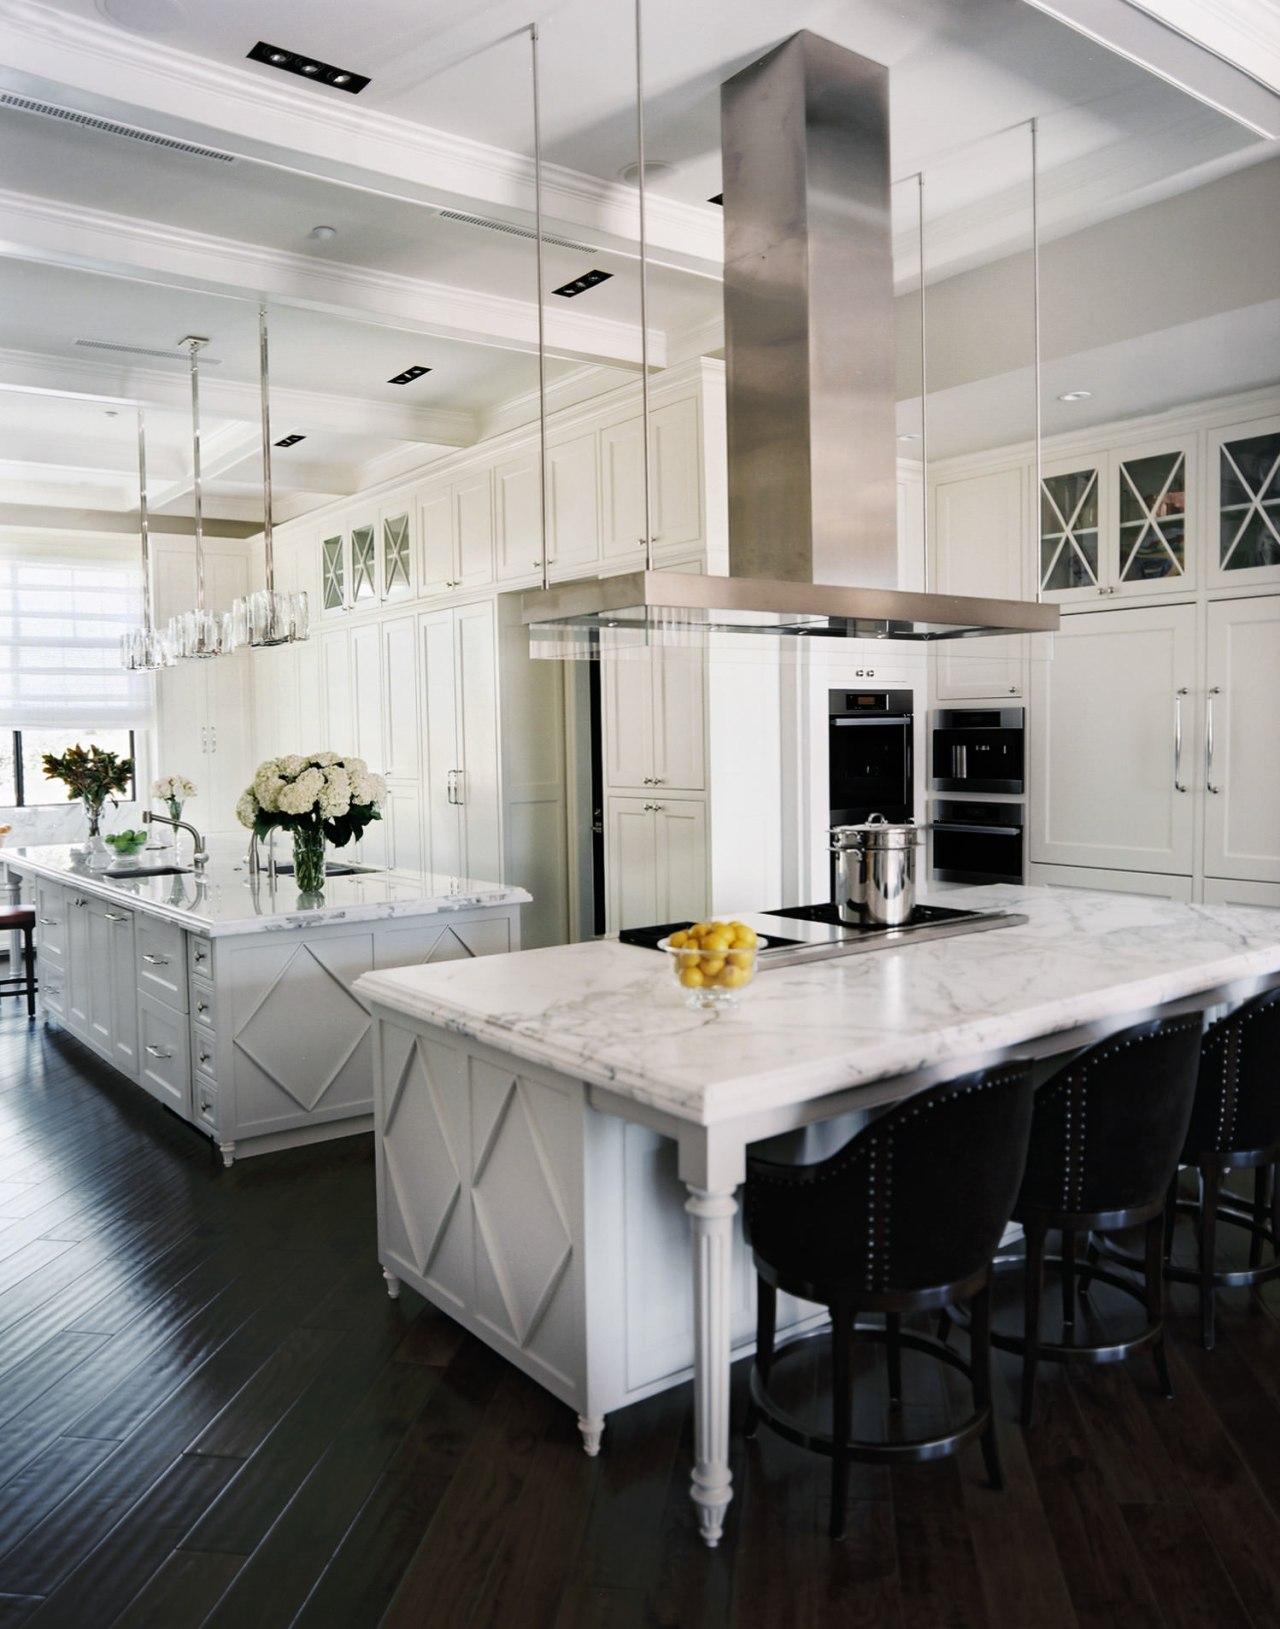 To enhance the sense of a living room, cabinetry, countertop, cuisine classique, floor, flooring, interior design, kitchen, laminate flooring, room, wood flooring, gray, black